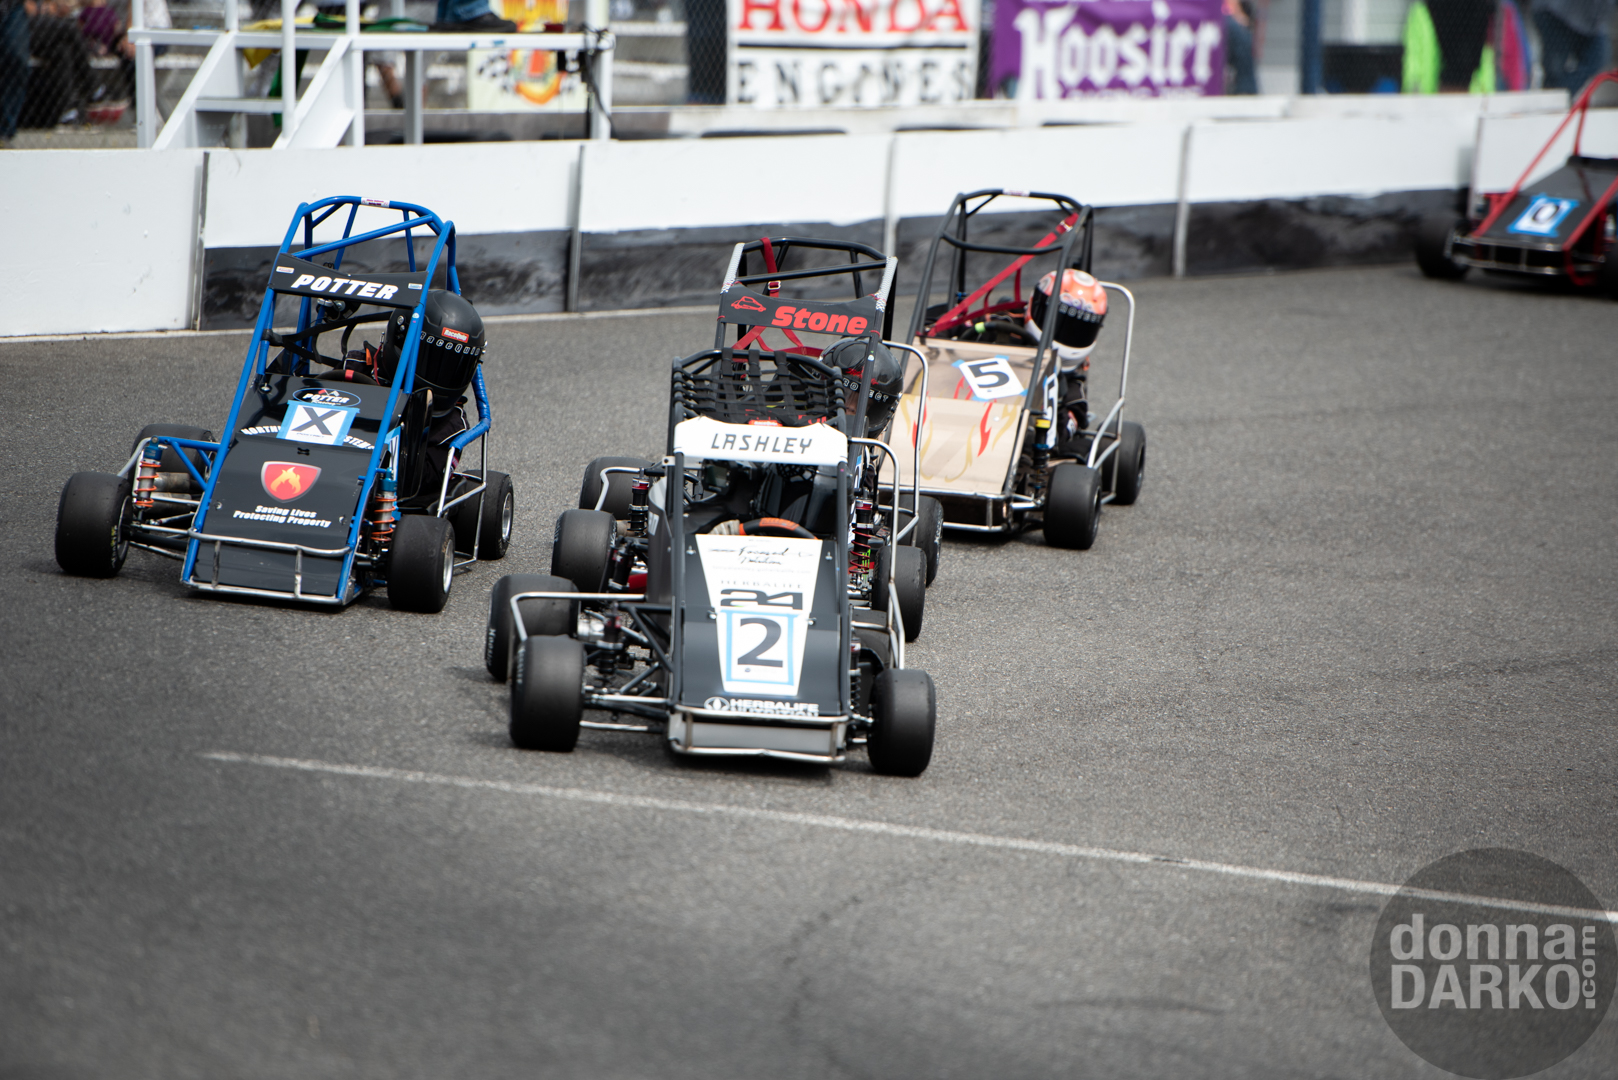 QWMA (Racing) 8-11-2019 DSC_7125.jpg